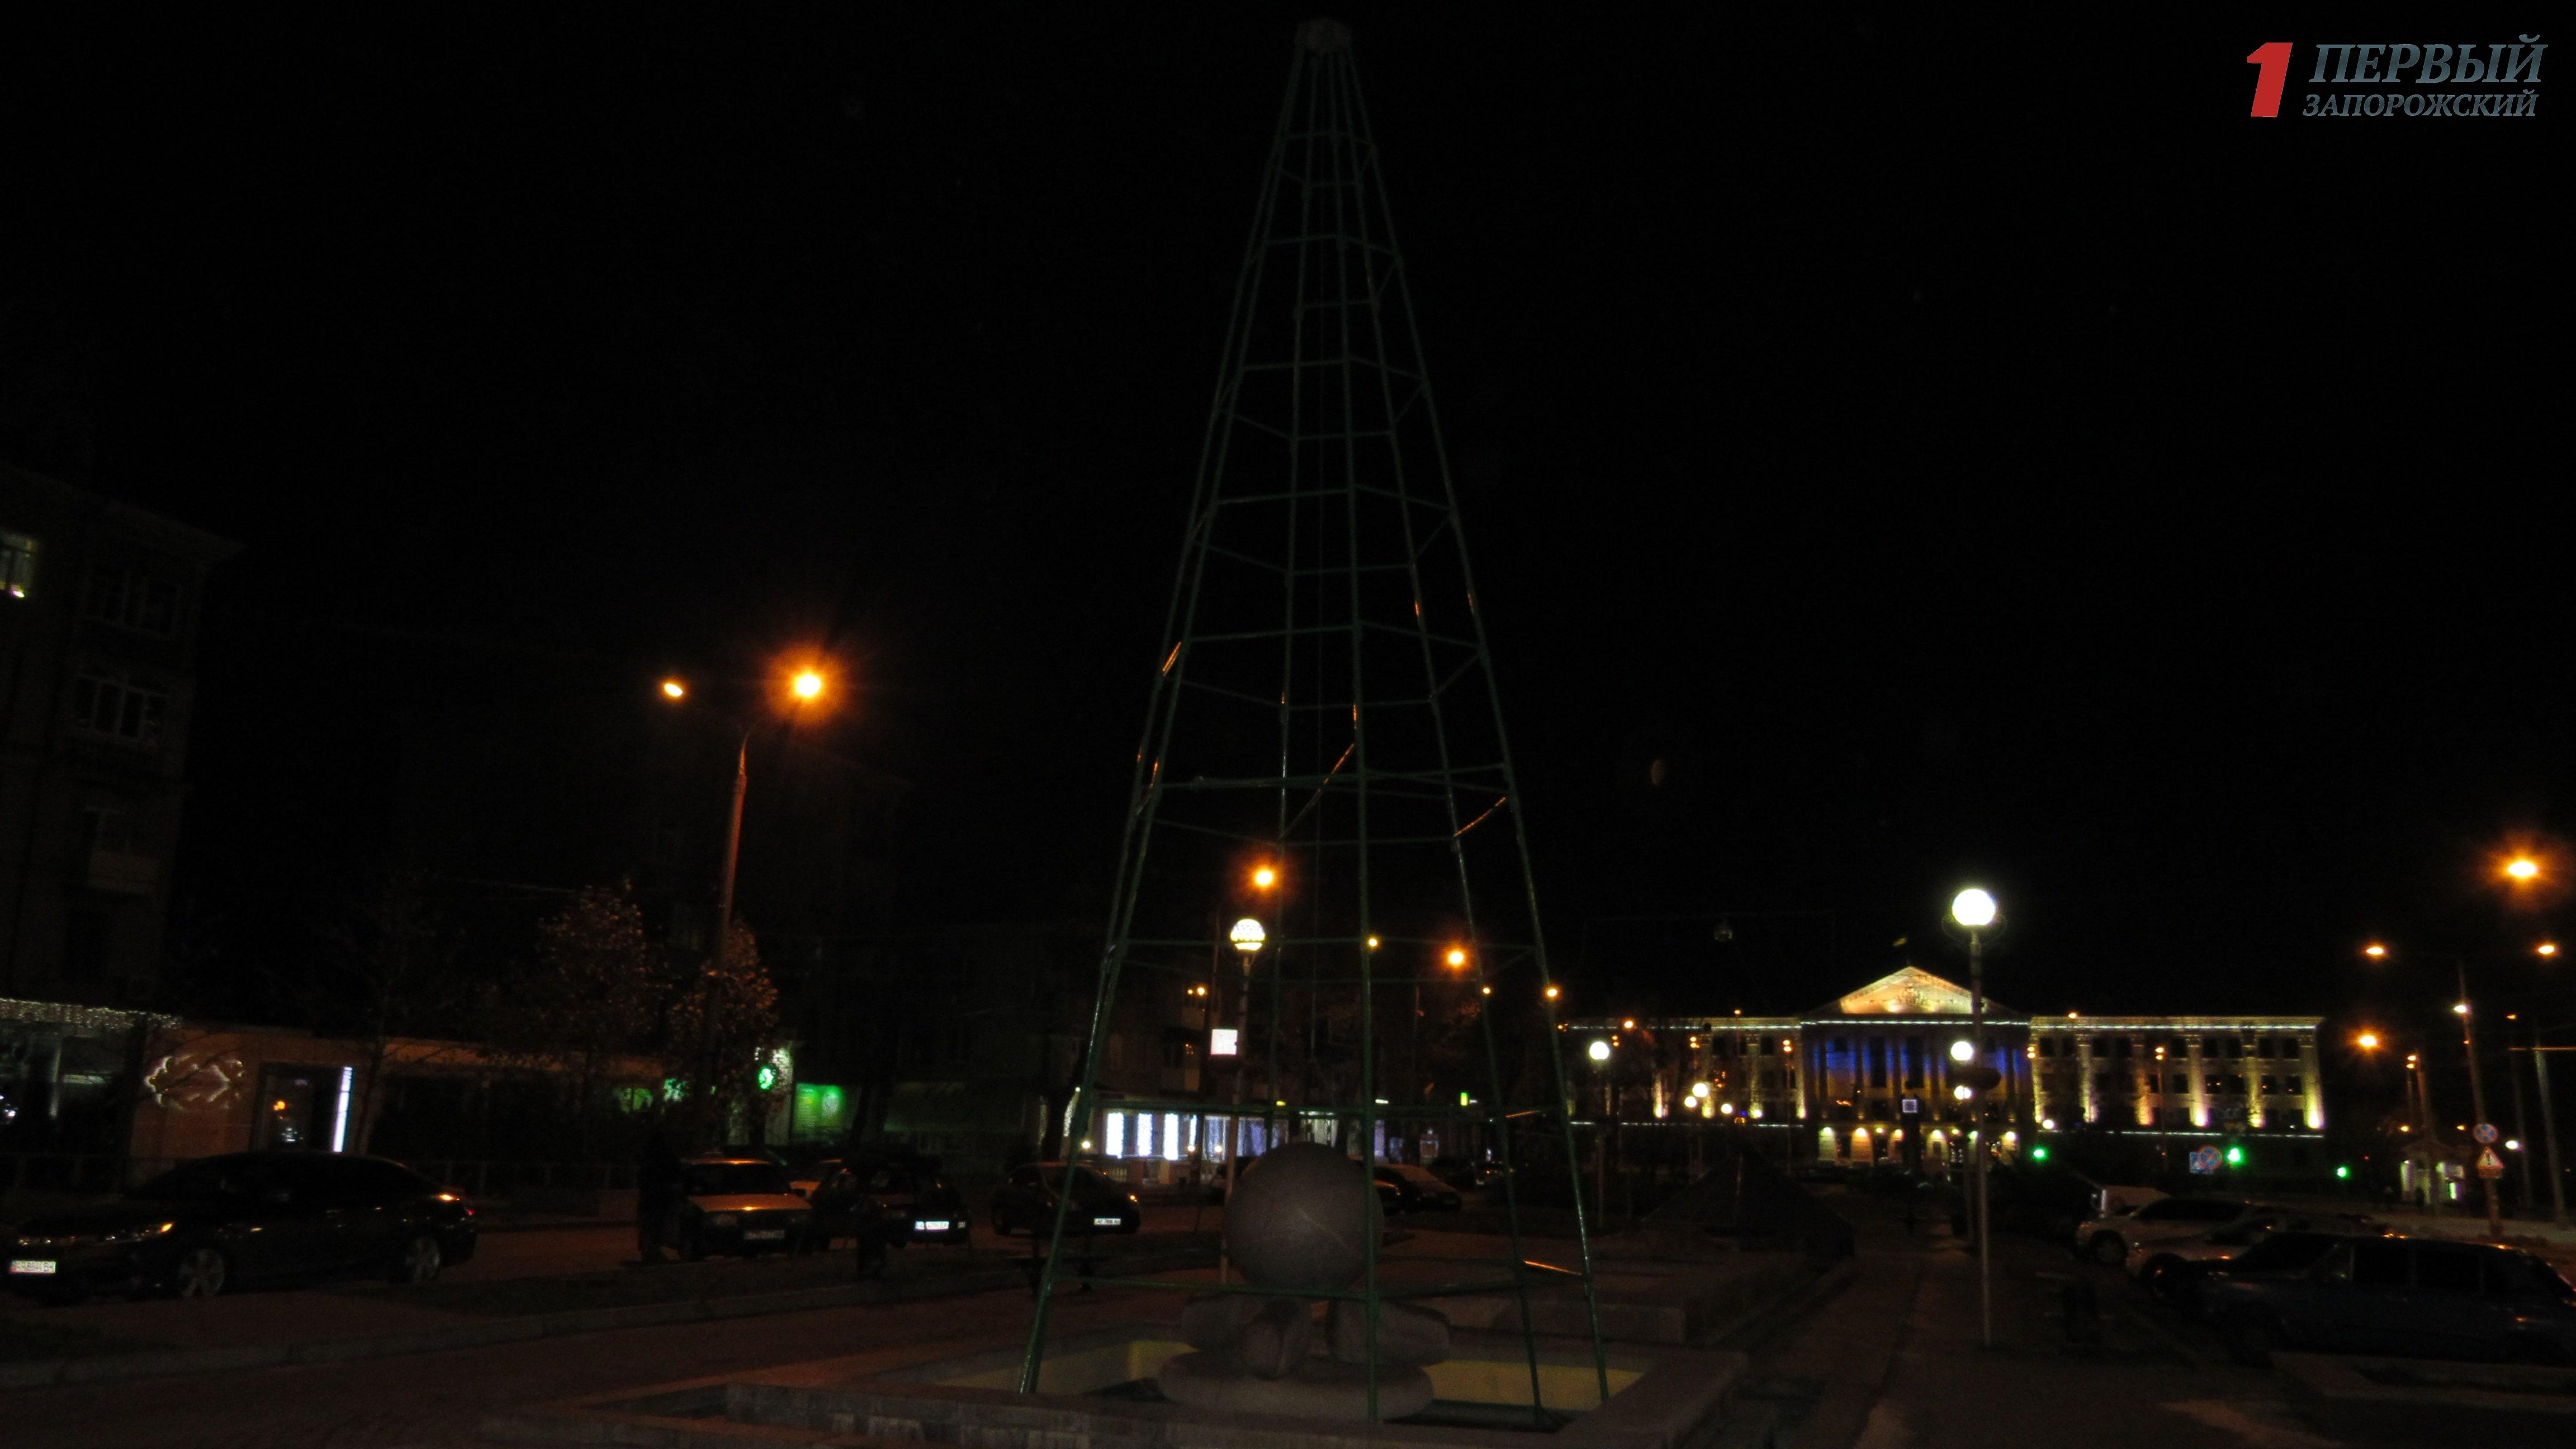 В Запорожье установили каркас для елки на бульваре Шевченко – ФОТО